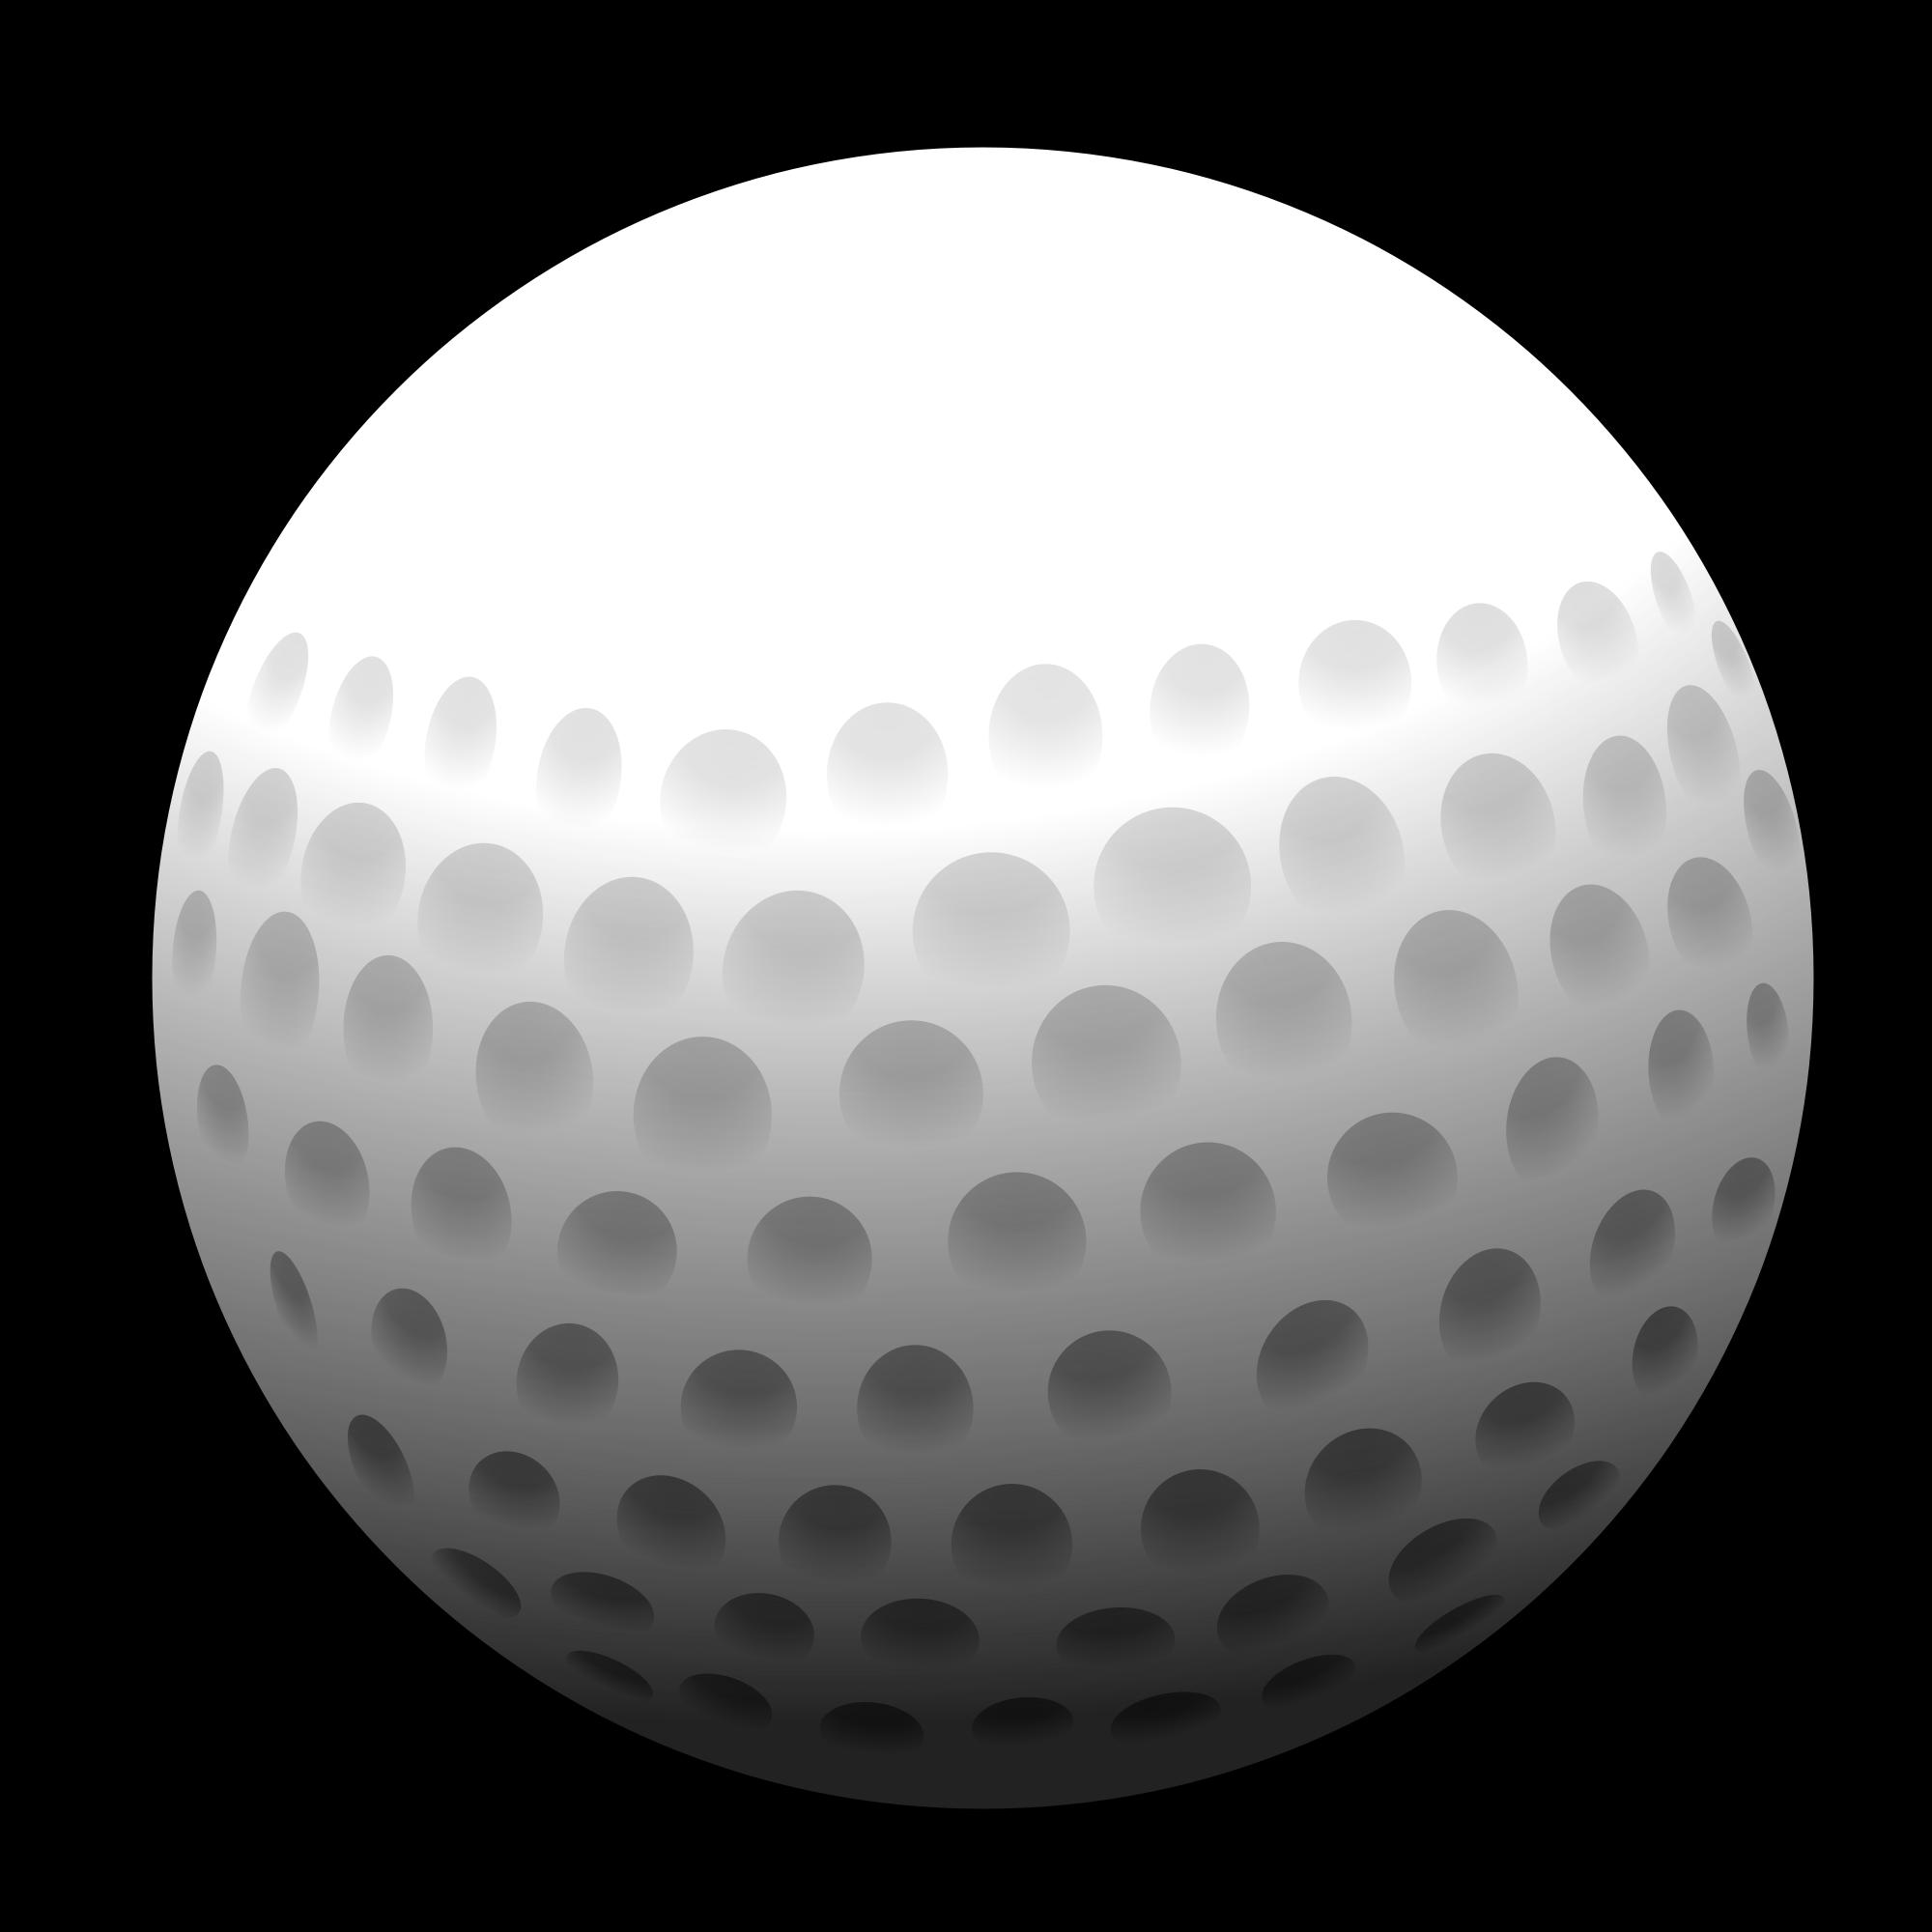 2000x2000 Golf Ball Vector File